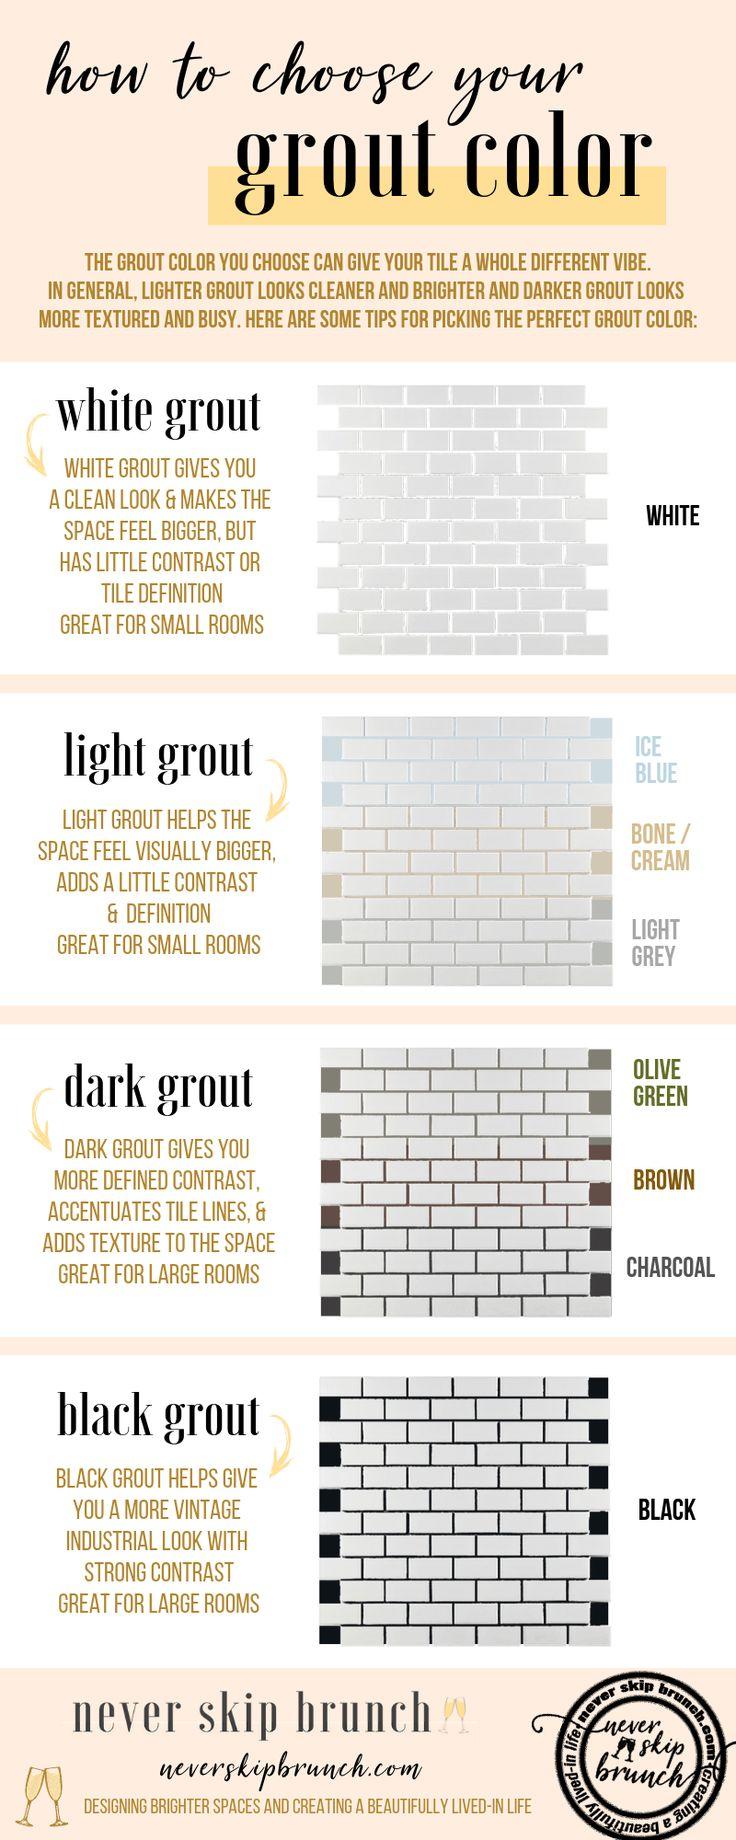 Backsplash Tile Refresh: How to Make White Tile Pop for under $20